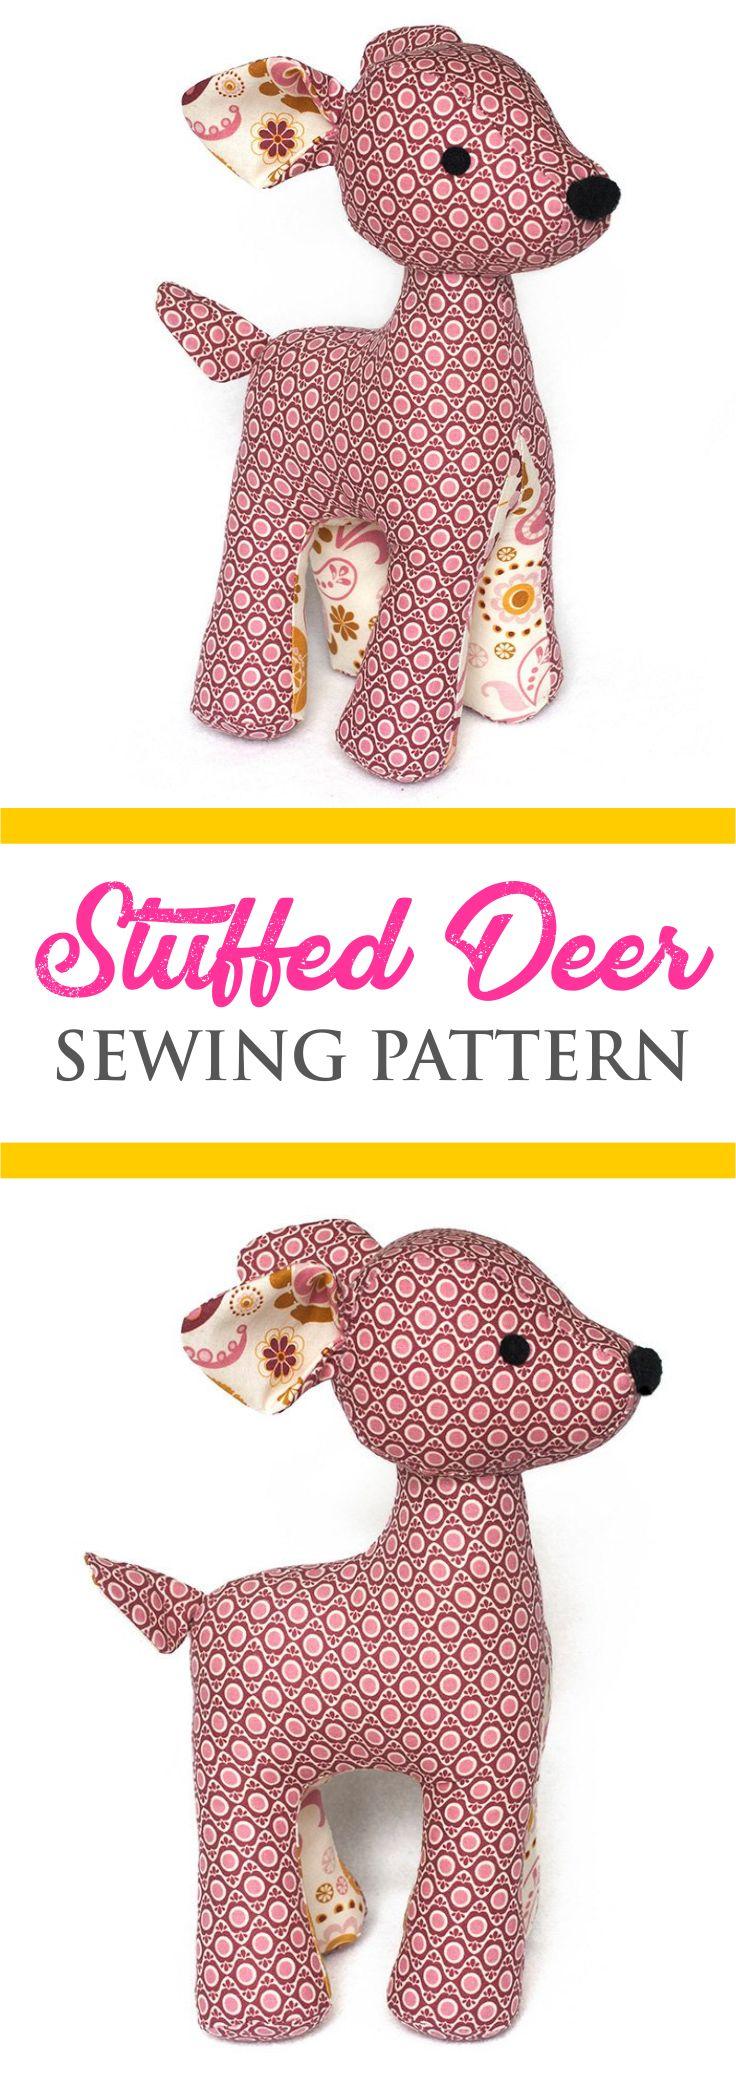 Stuffed Deer Sewing Pattern